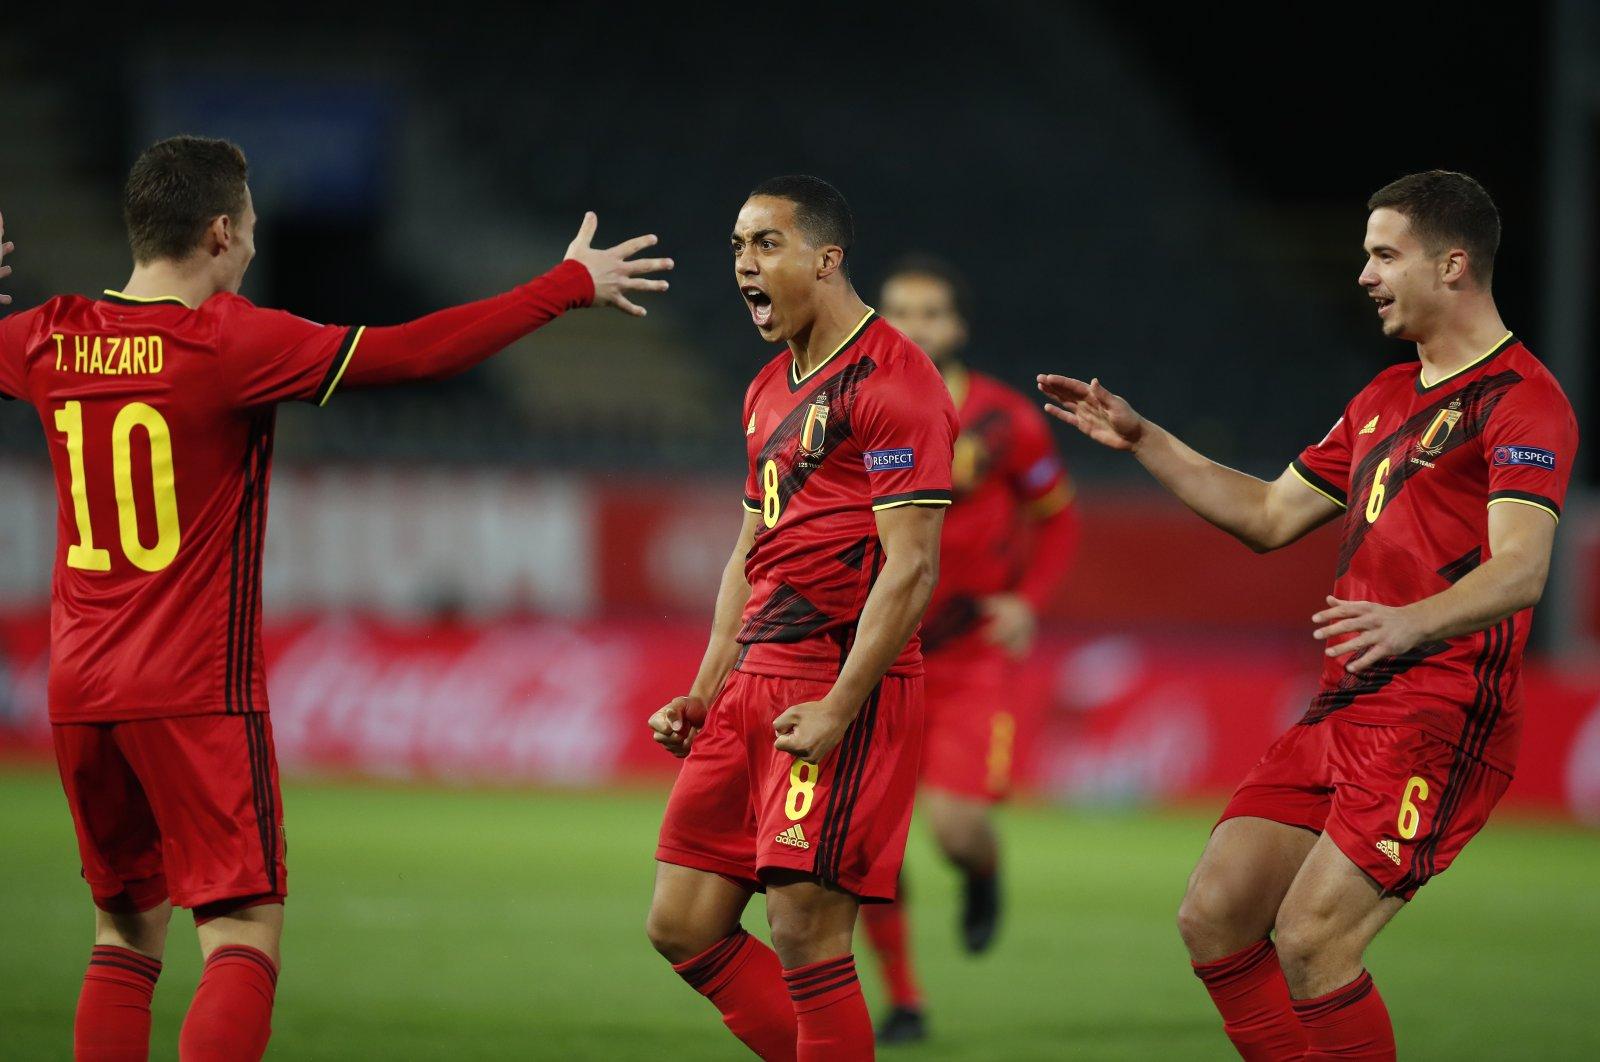 Belgium players celebrate a goal during a UEFA Nations League match against Denmark, in Leuven, Belgium, Nov. 18, 2020. (AP Photo)